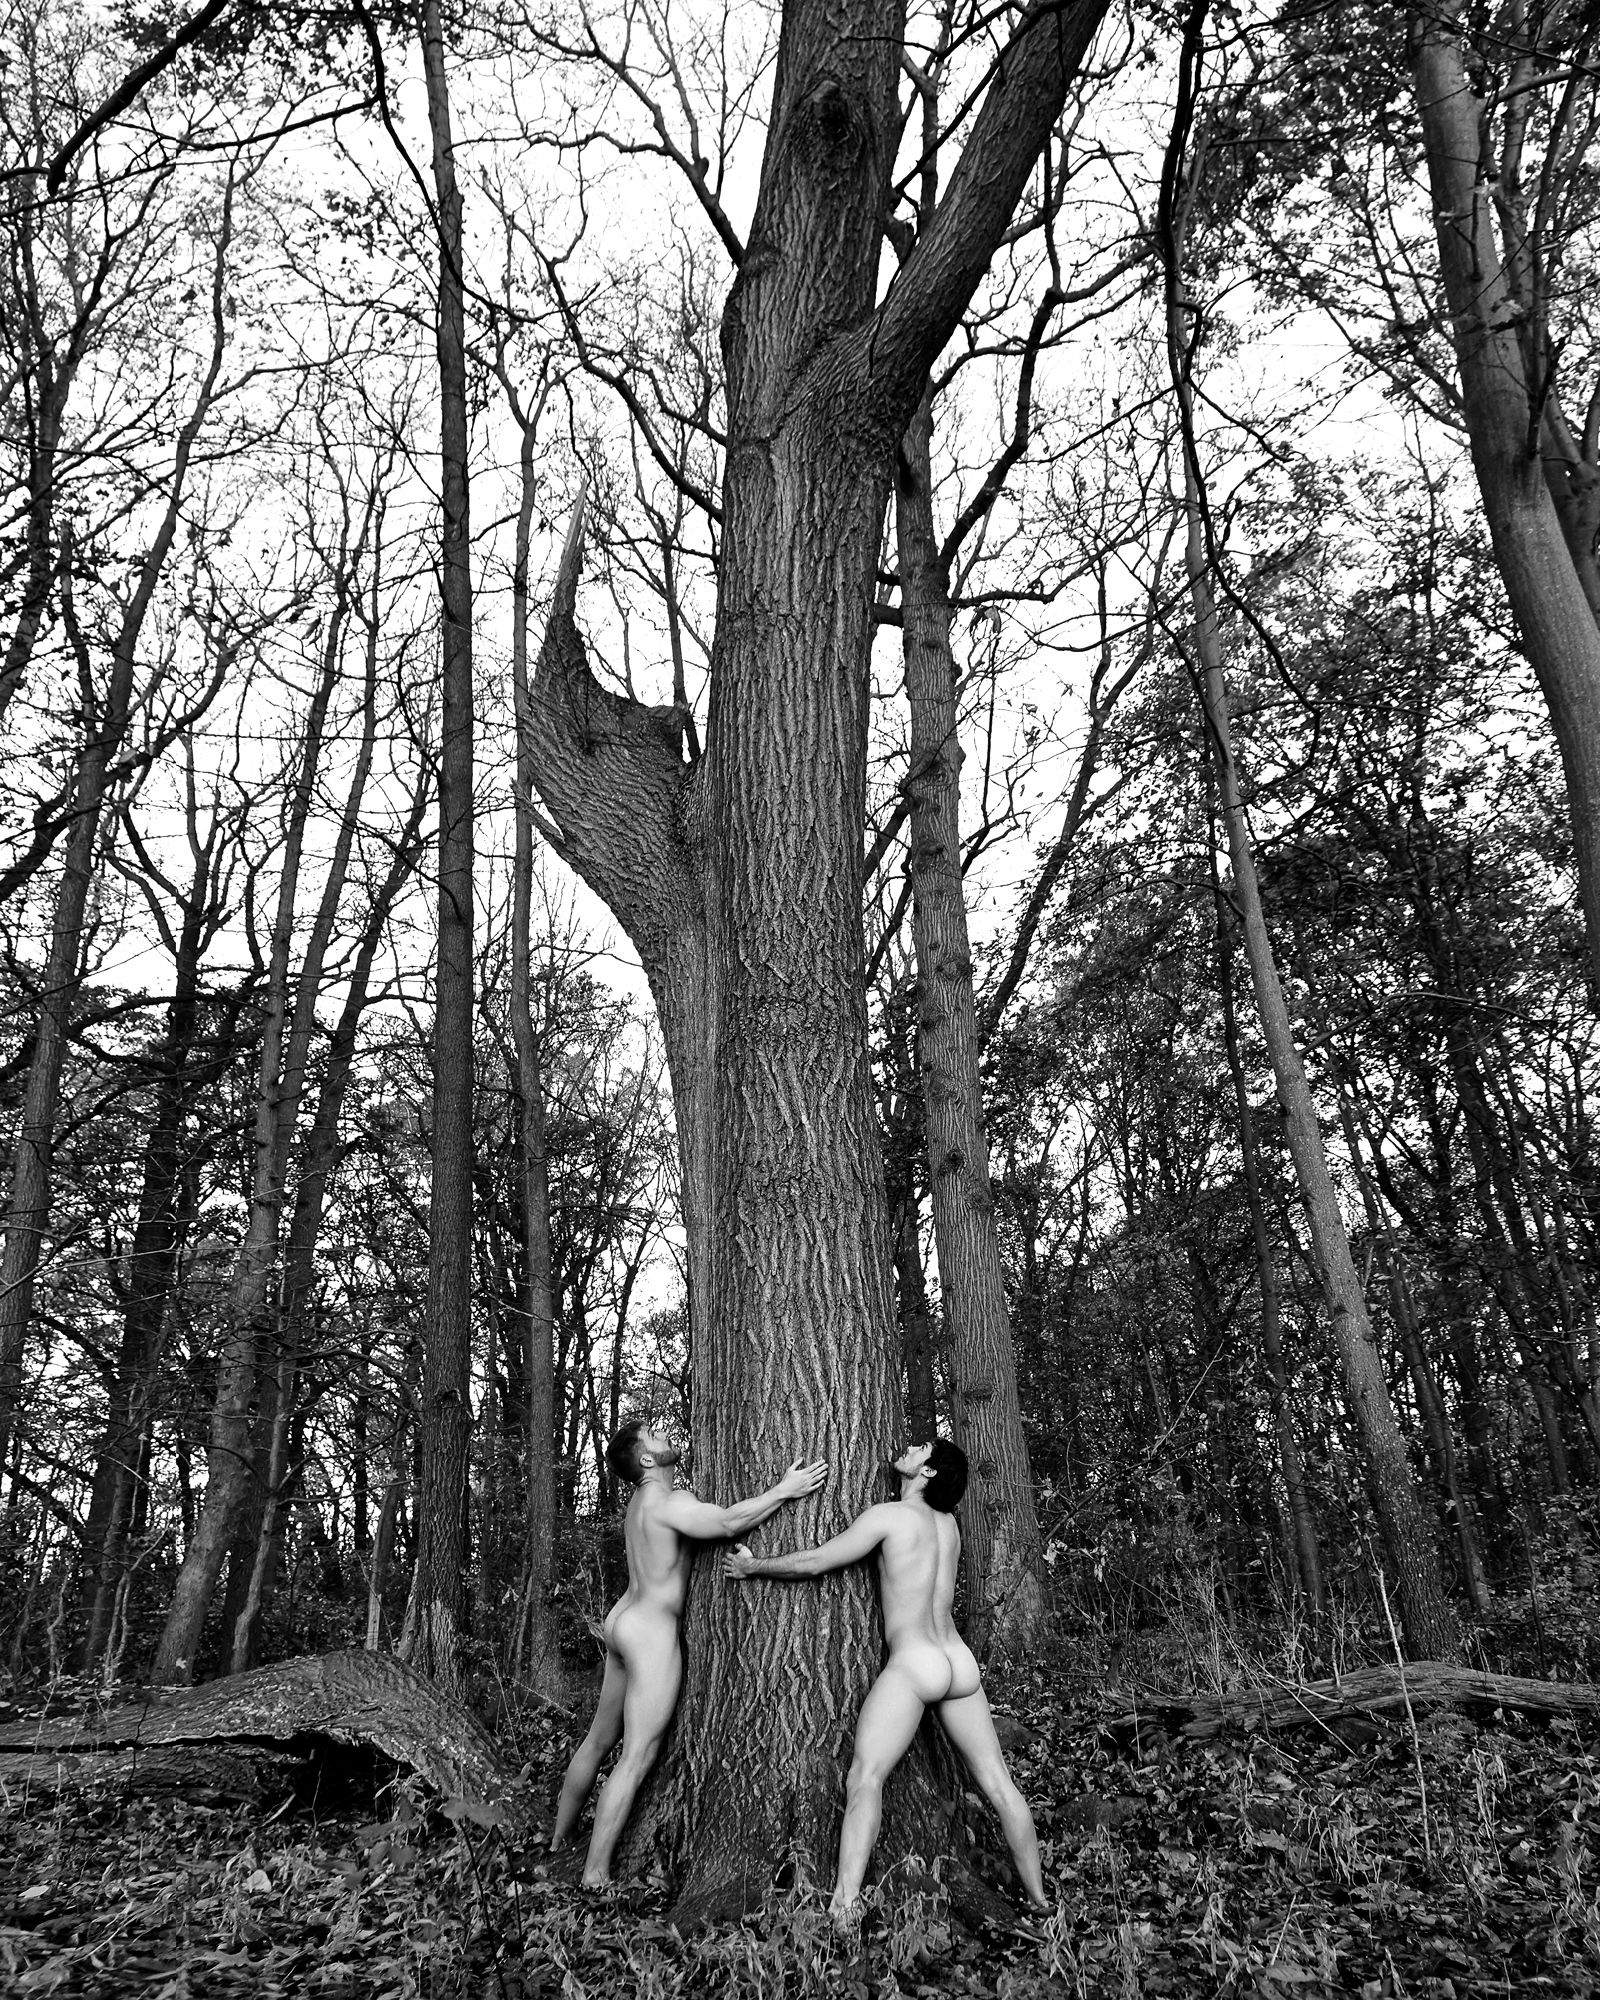 Trees_36.25x43.25.jpg